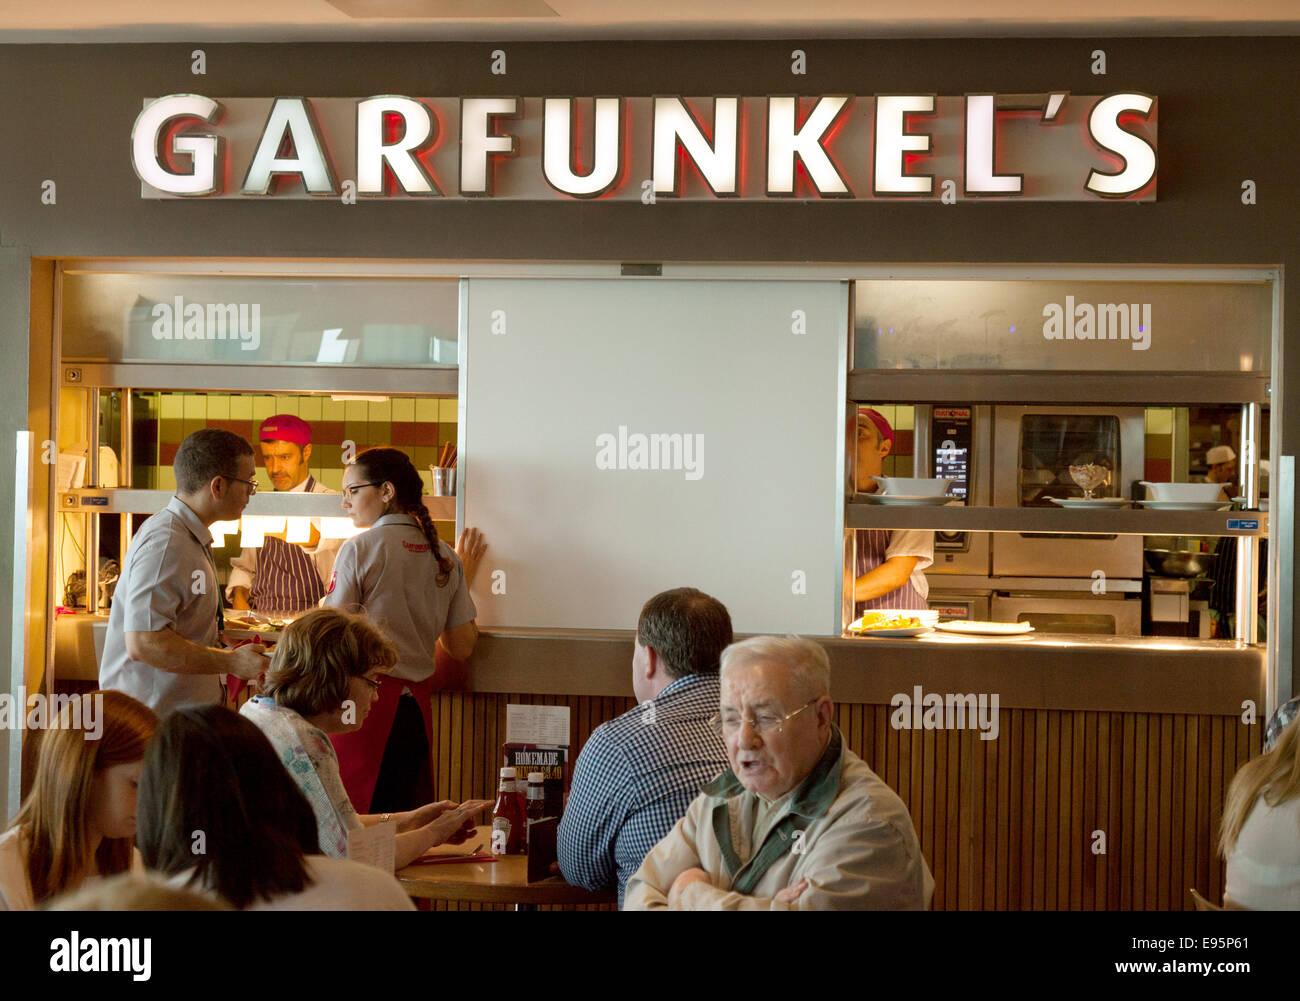 Garfunkels restaurant, North terminal, Gatwick airport UK - Stock Image